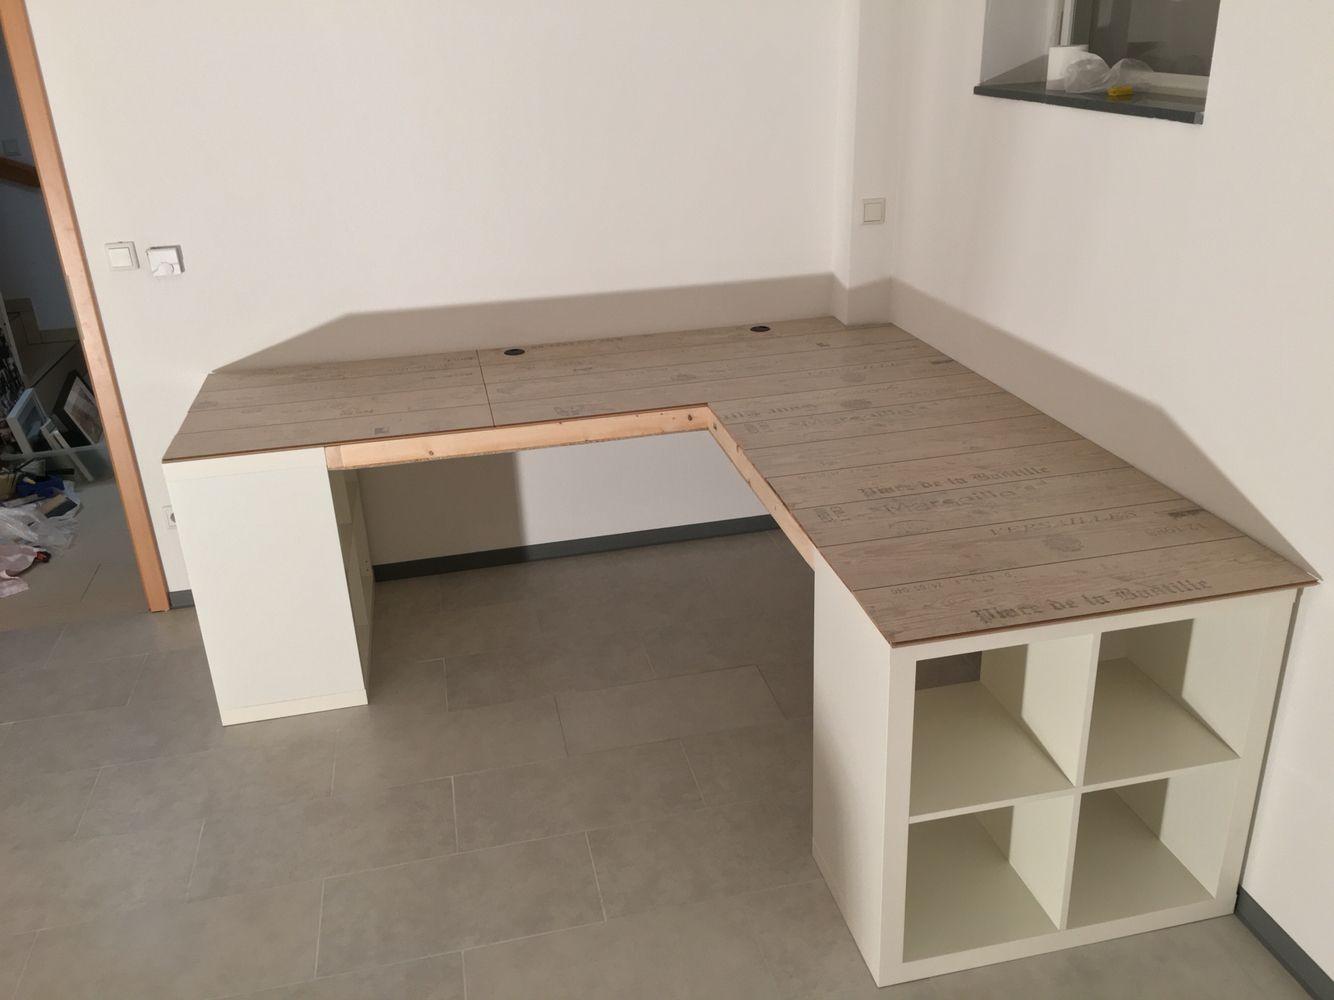 Blickfang Regal Schreibtisch Beste Wahl Ikea Expedit Laminaten Mehr